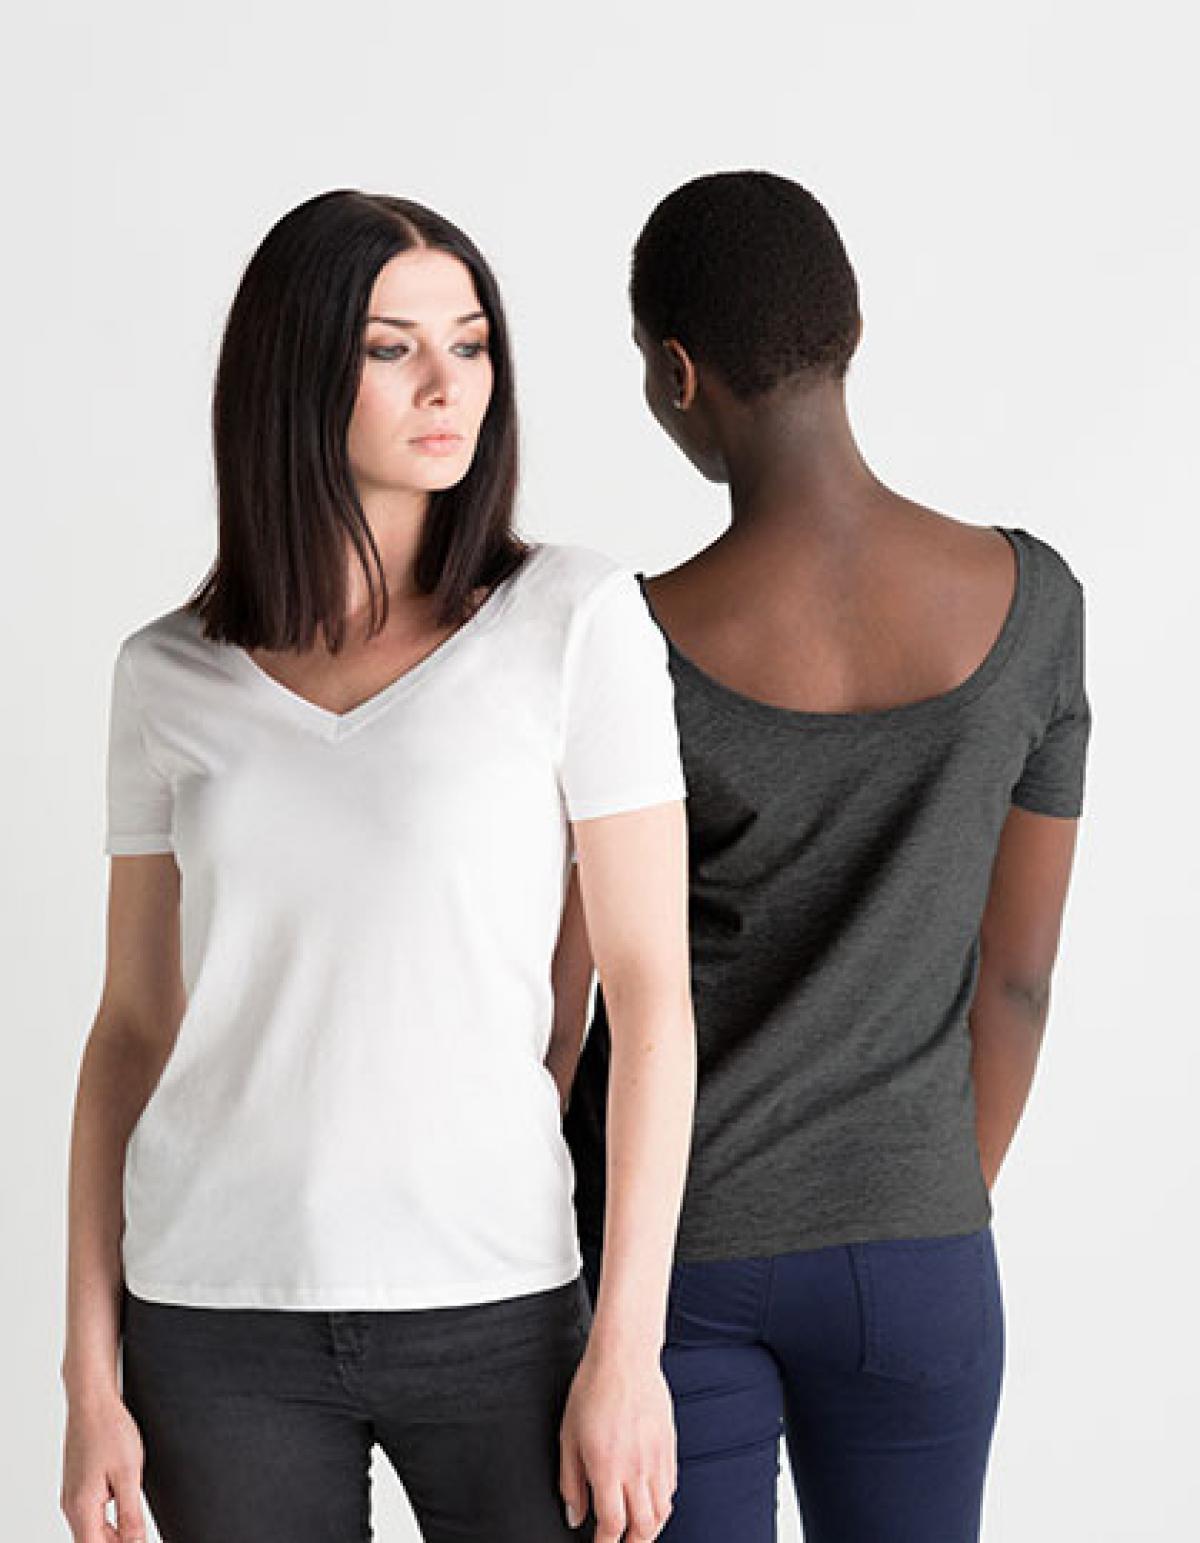 damen sommer v neck t shirt mit u ausschnitt rexlander s. Black Bedroom Furniture Sets. Home Design Ideas